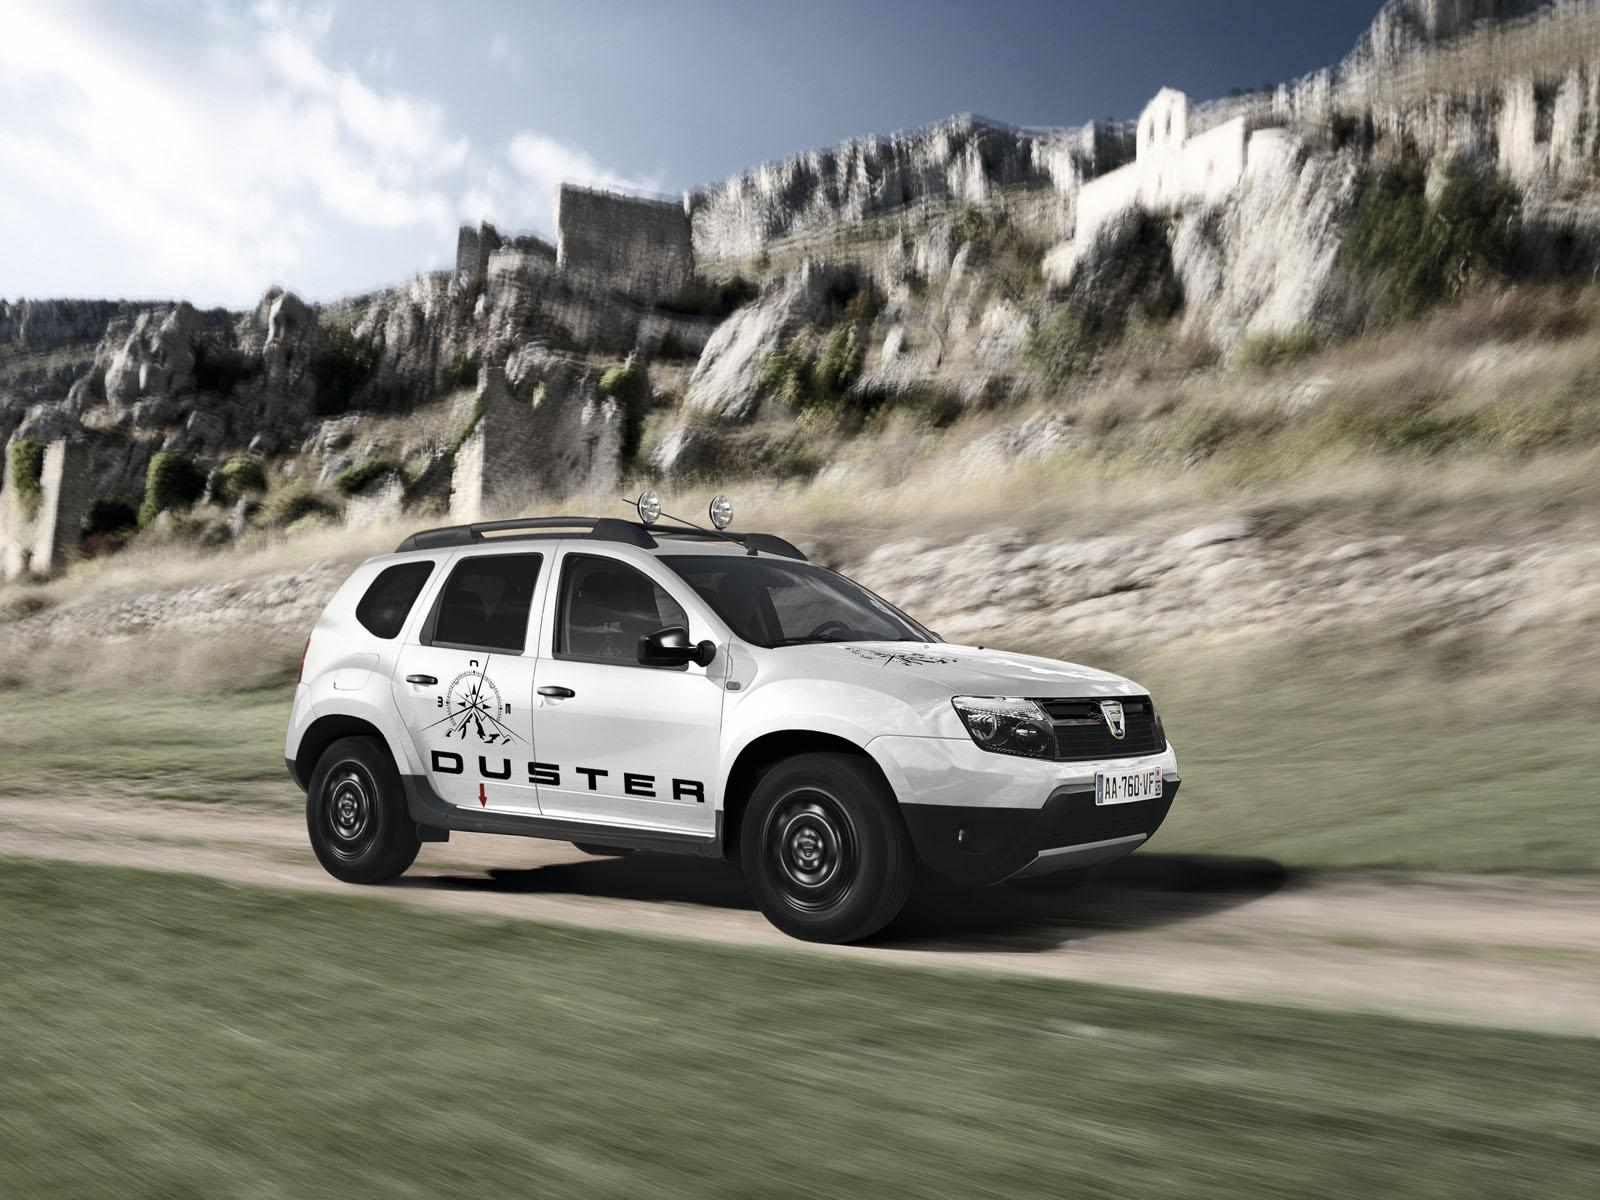 2013 Geneva Motor Show: Dacia Duster Adventure Edition  - фотография №2